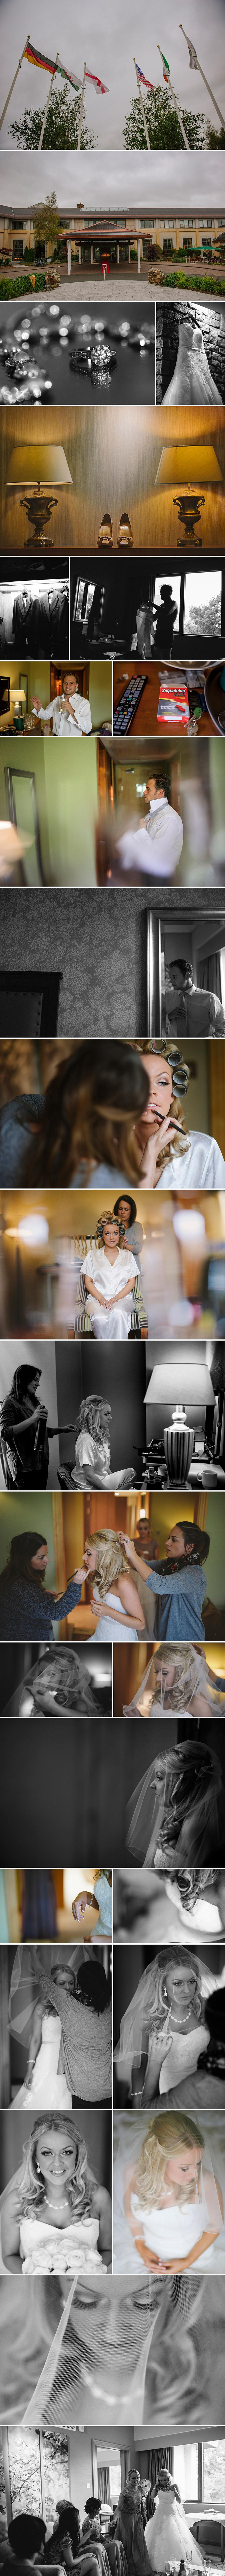 D + R | Druids Glen Hotel & Resort Wedding | Irish Wedding Photography | 3